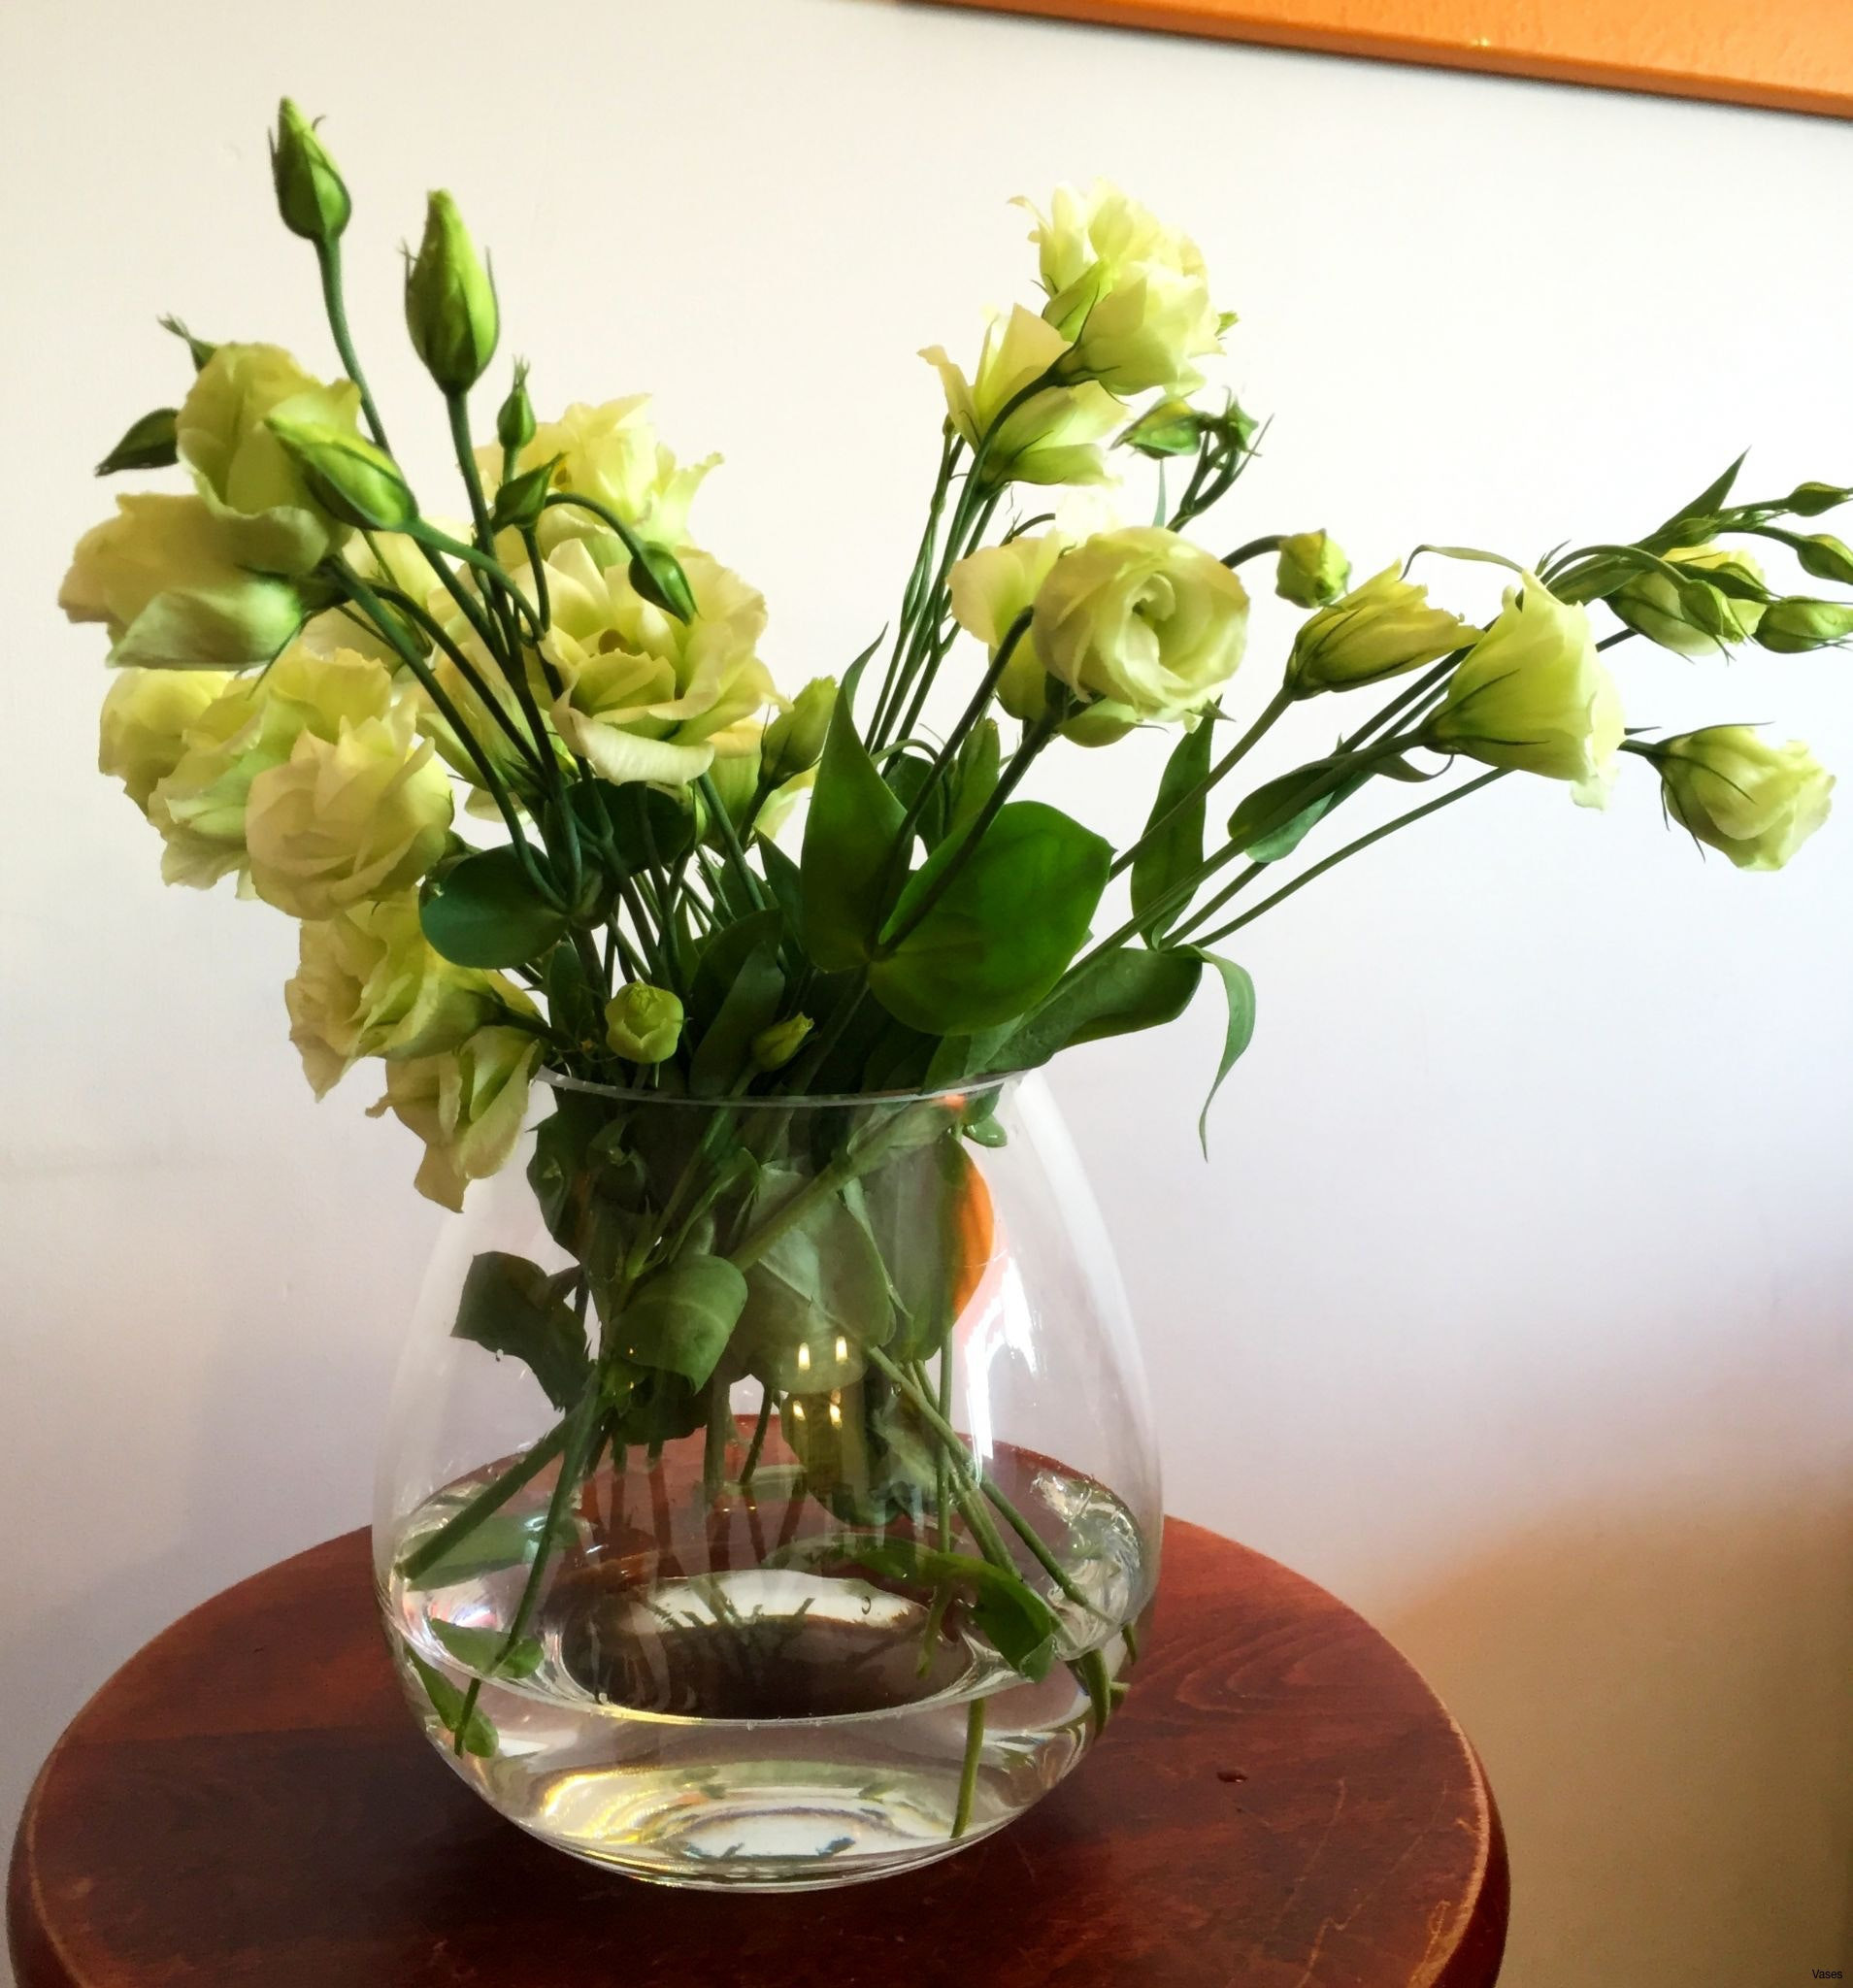 custom flower vase of table de soudage meilleur de mirrored square vase 3h vases mirror pertaining to related post